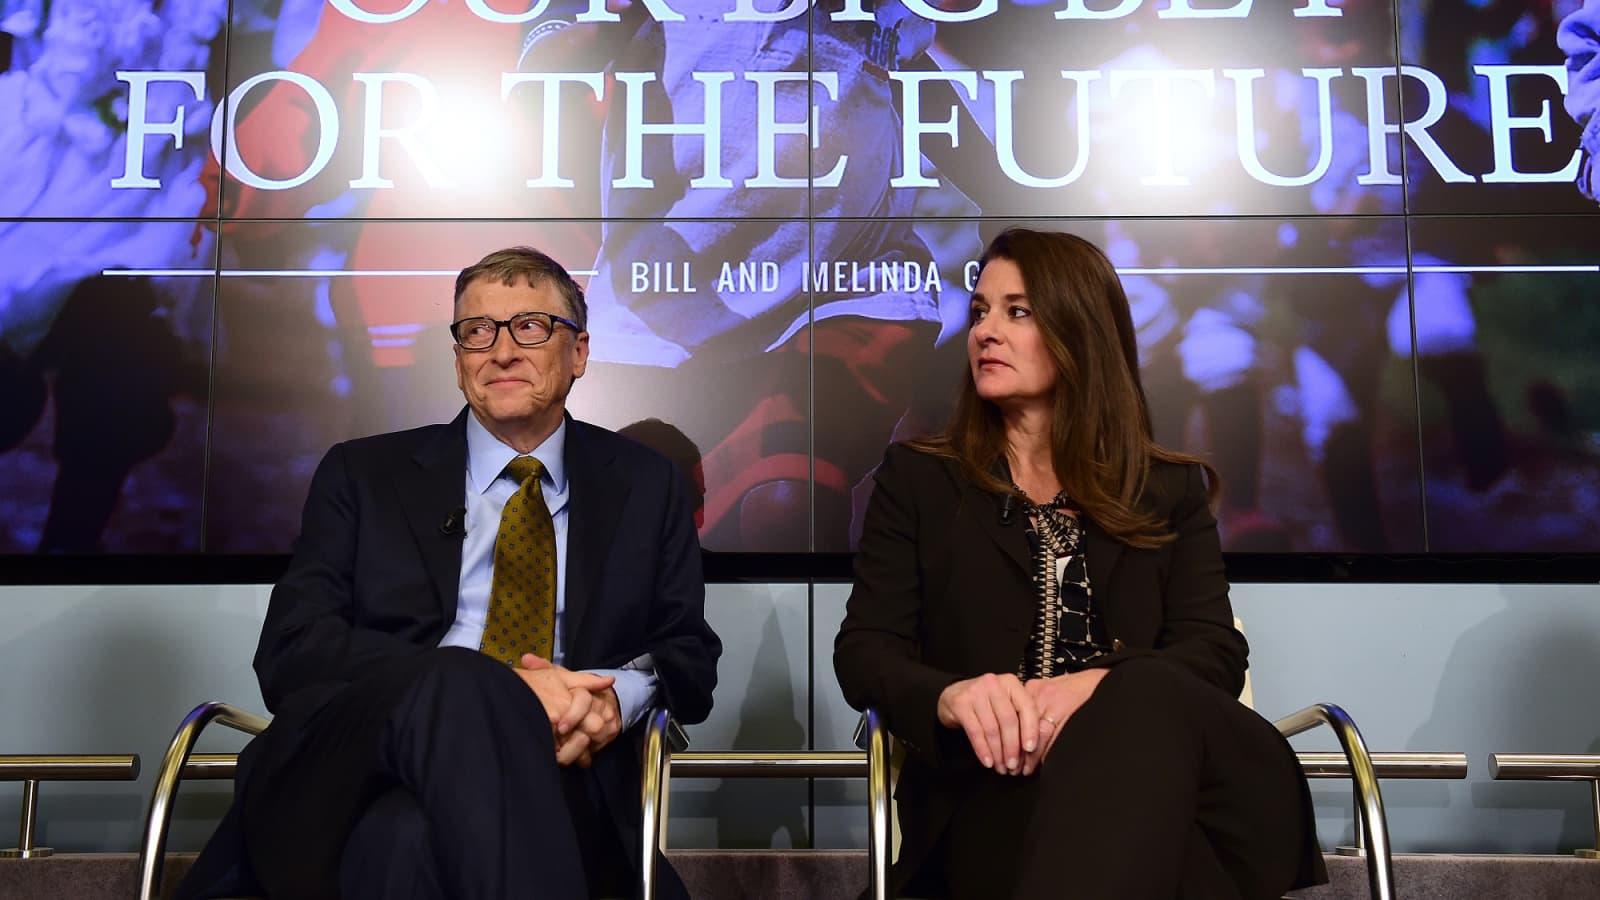 Gates foundation places big bet on its teacher agenda multiple betting explained